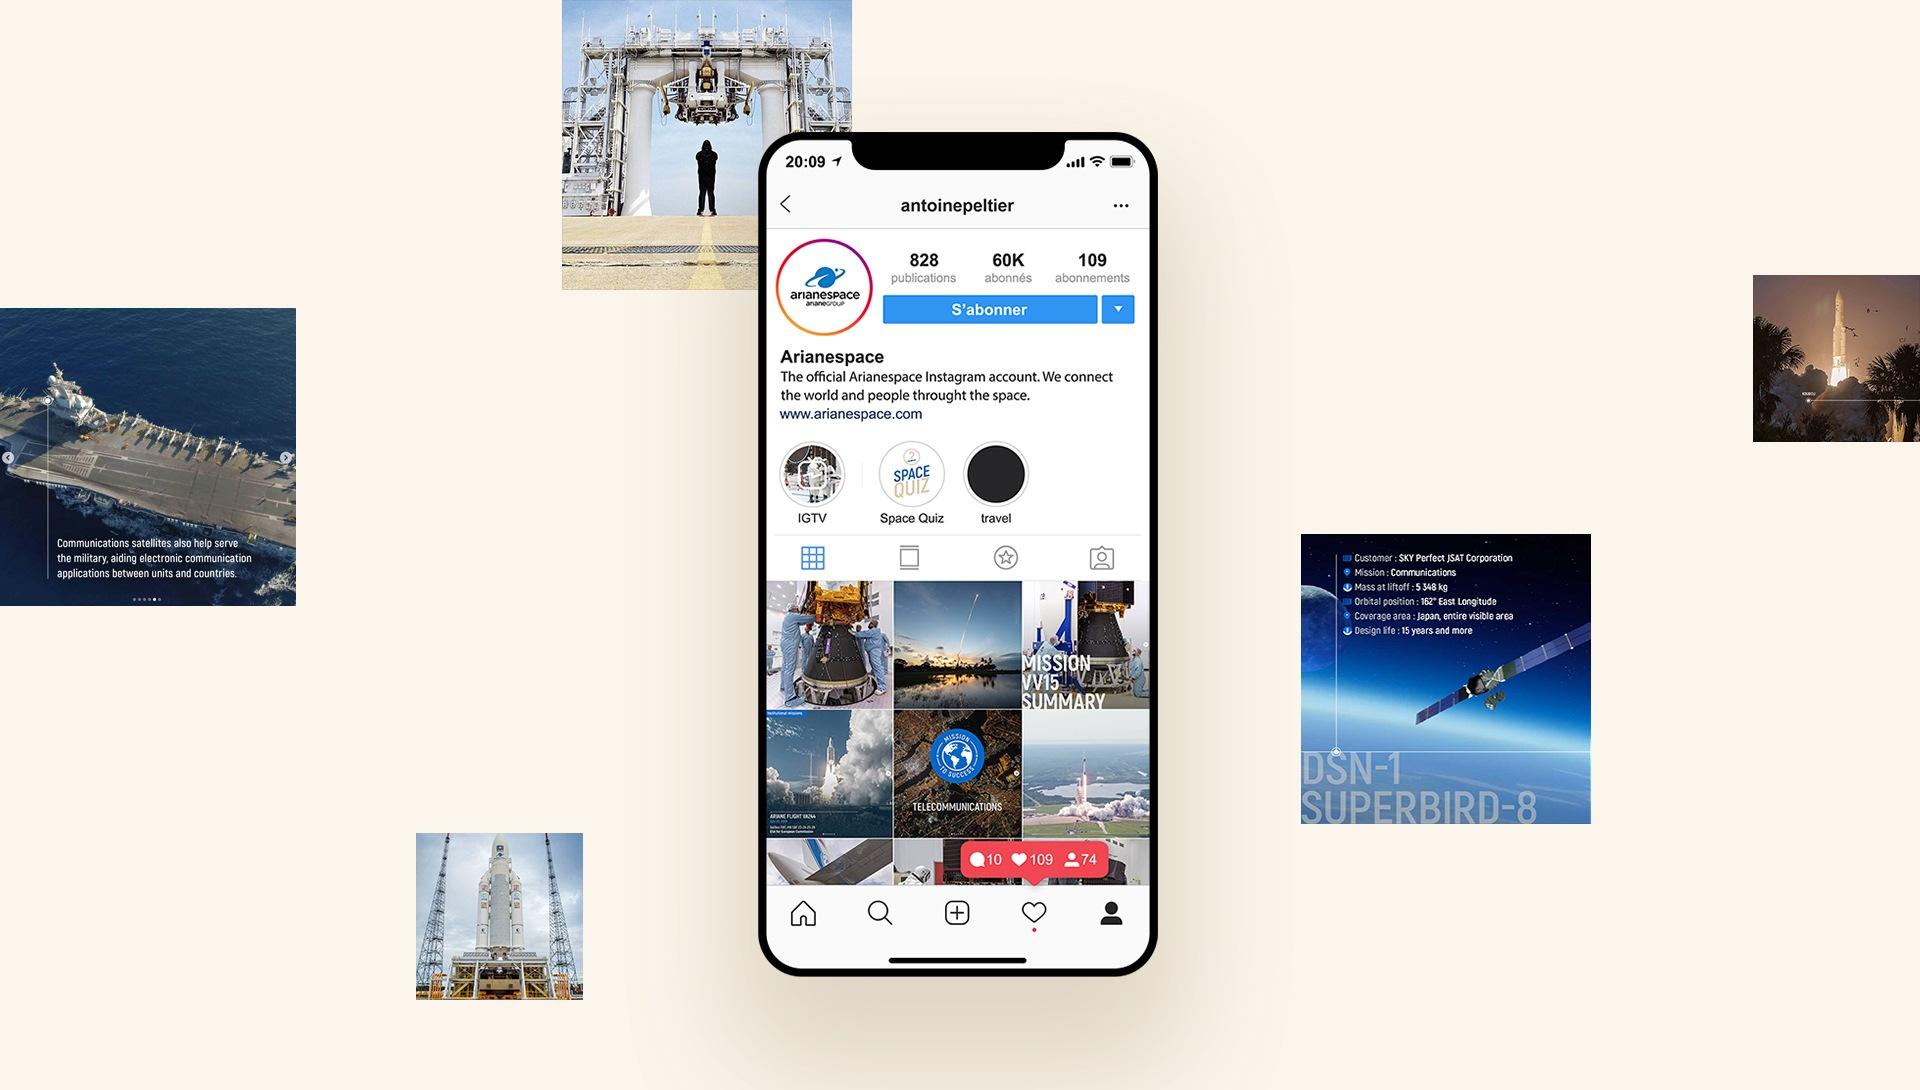 Social-Media-Instagram-Arianespace-Antoine-Peltier-4